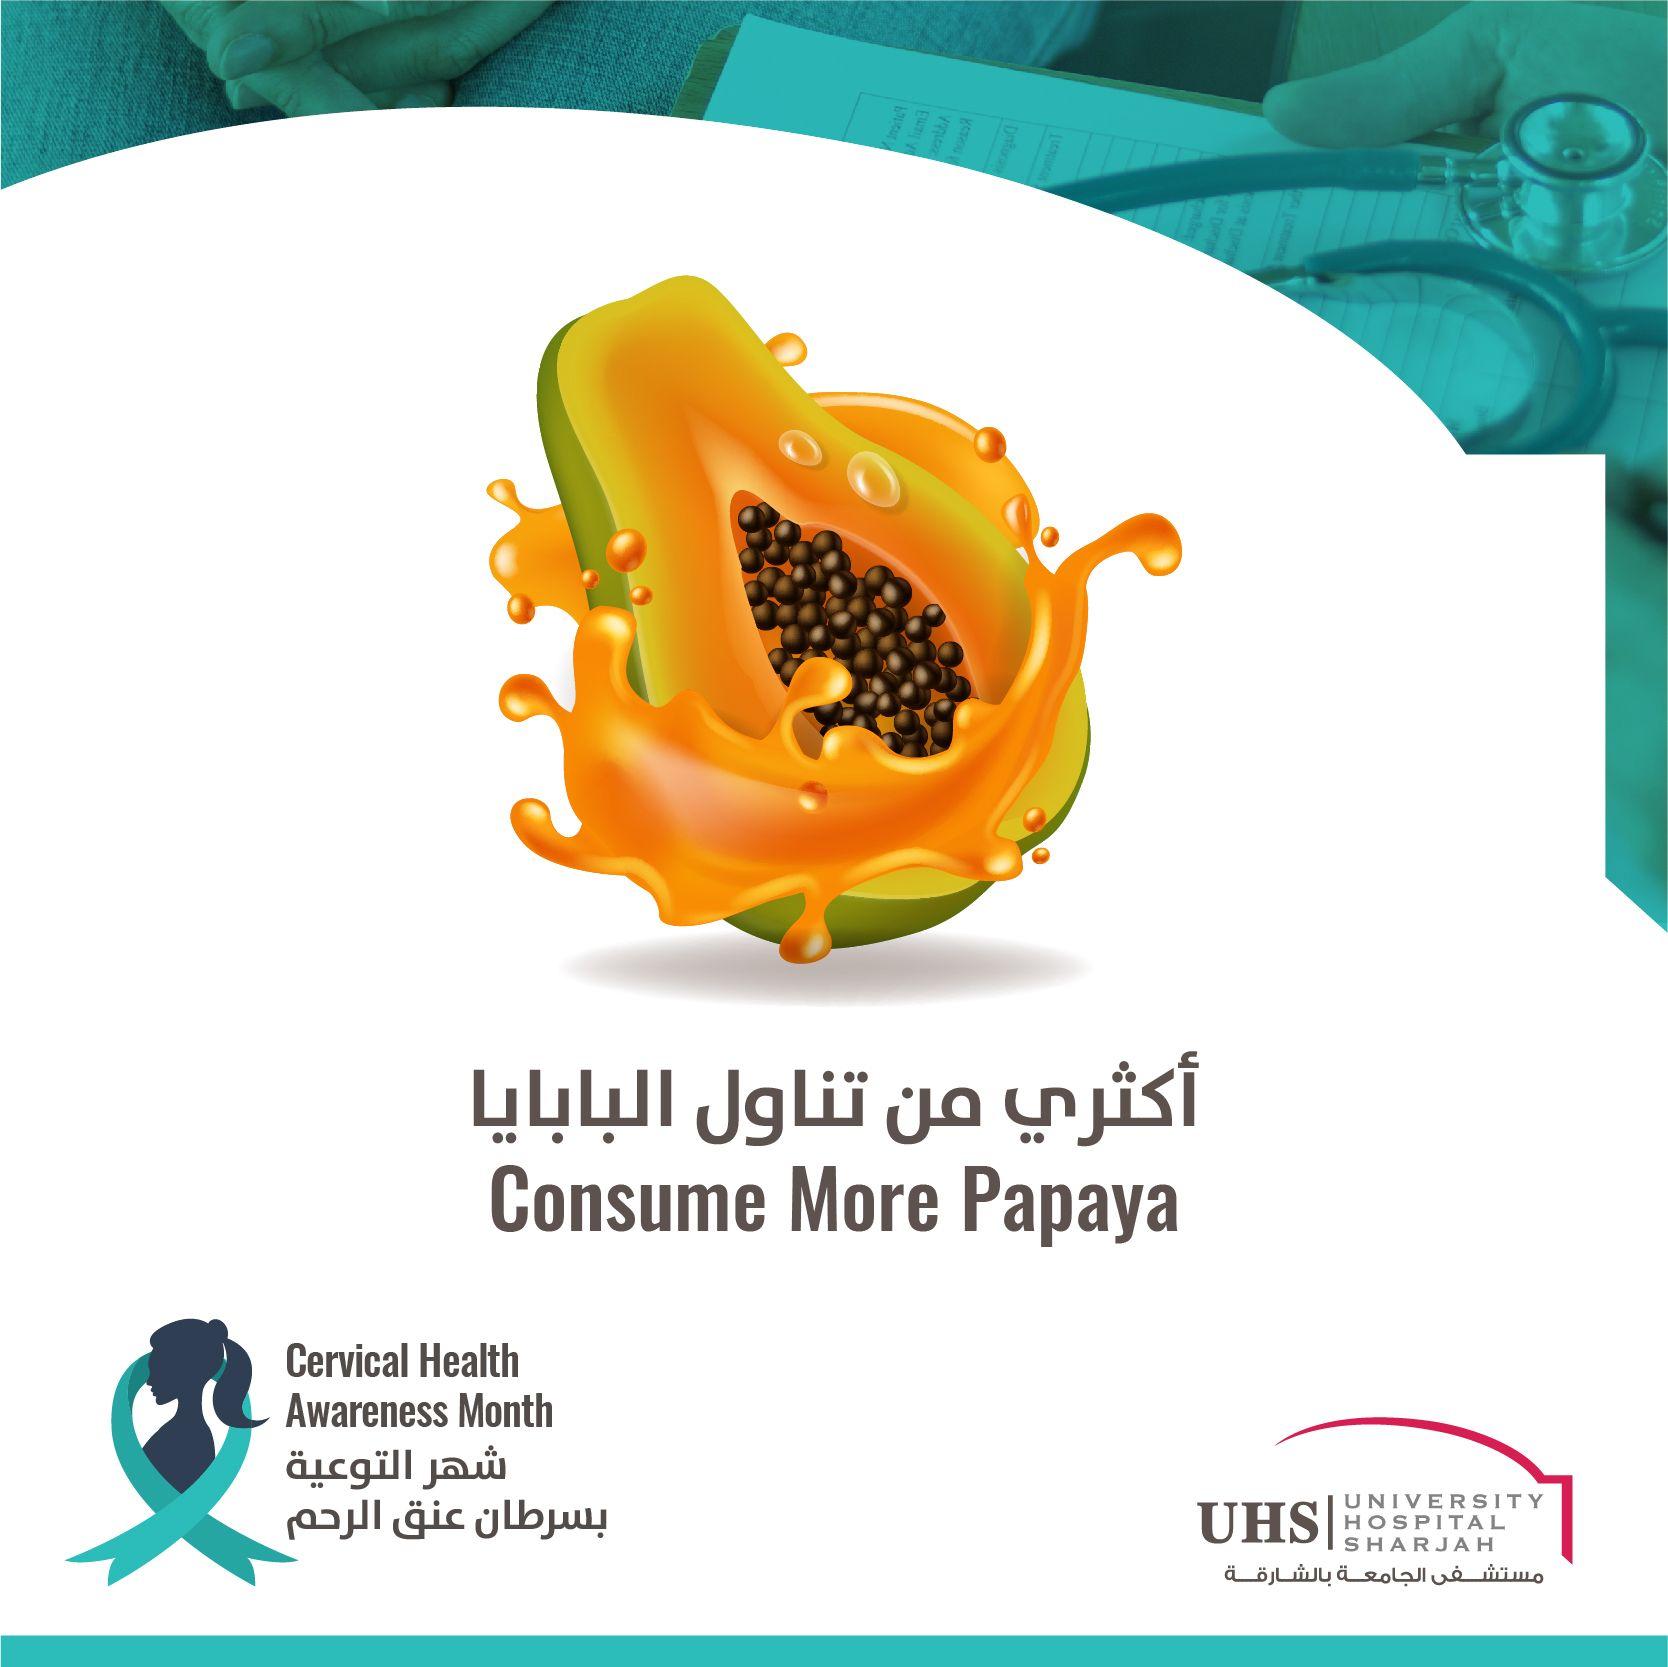 Pin By Hana Rehan On الحملة الوطنية الاولى توعية سرطان عنق الرحم ليبي Health Awareness Months Health Awareness Awareness Month